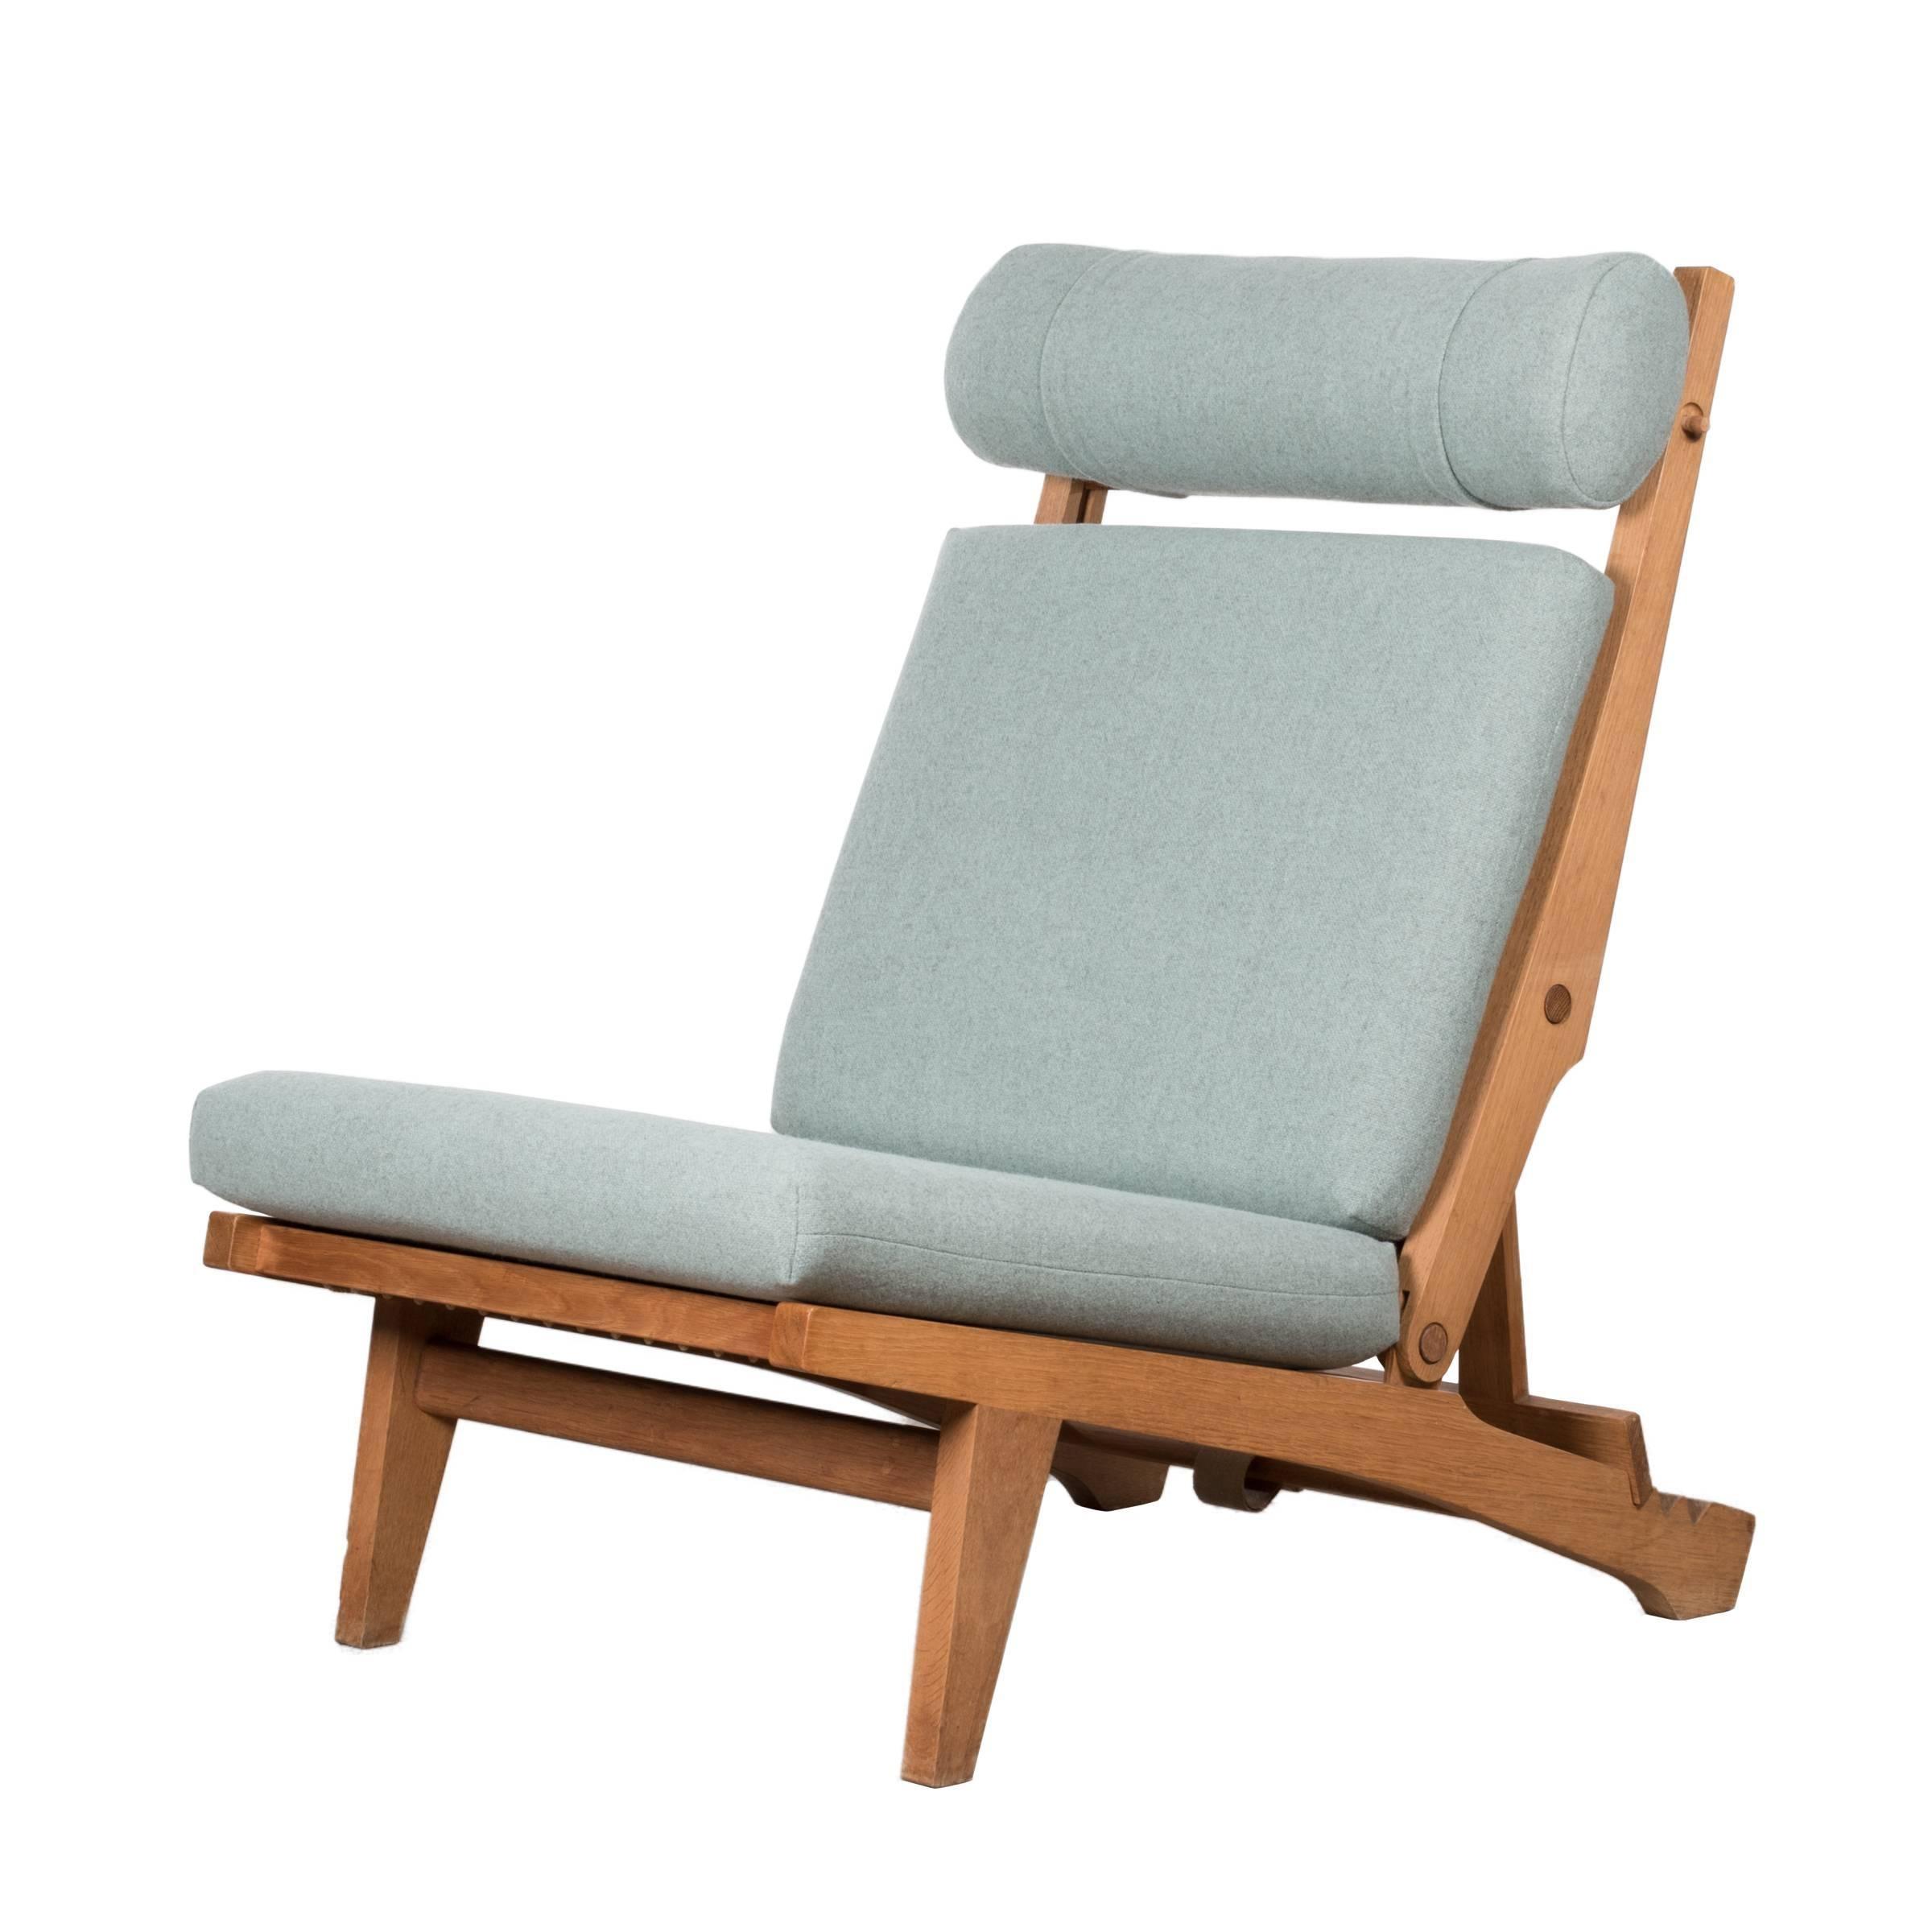 Hans Wegner Ap71 Lounge Chair with Green Kvadrat Fabric for AP Stolen, Denmark